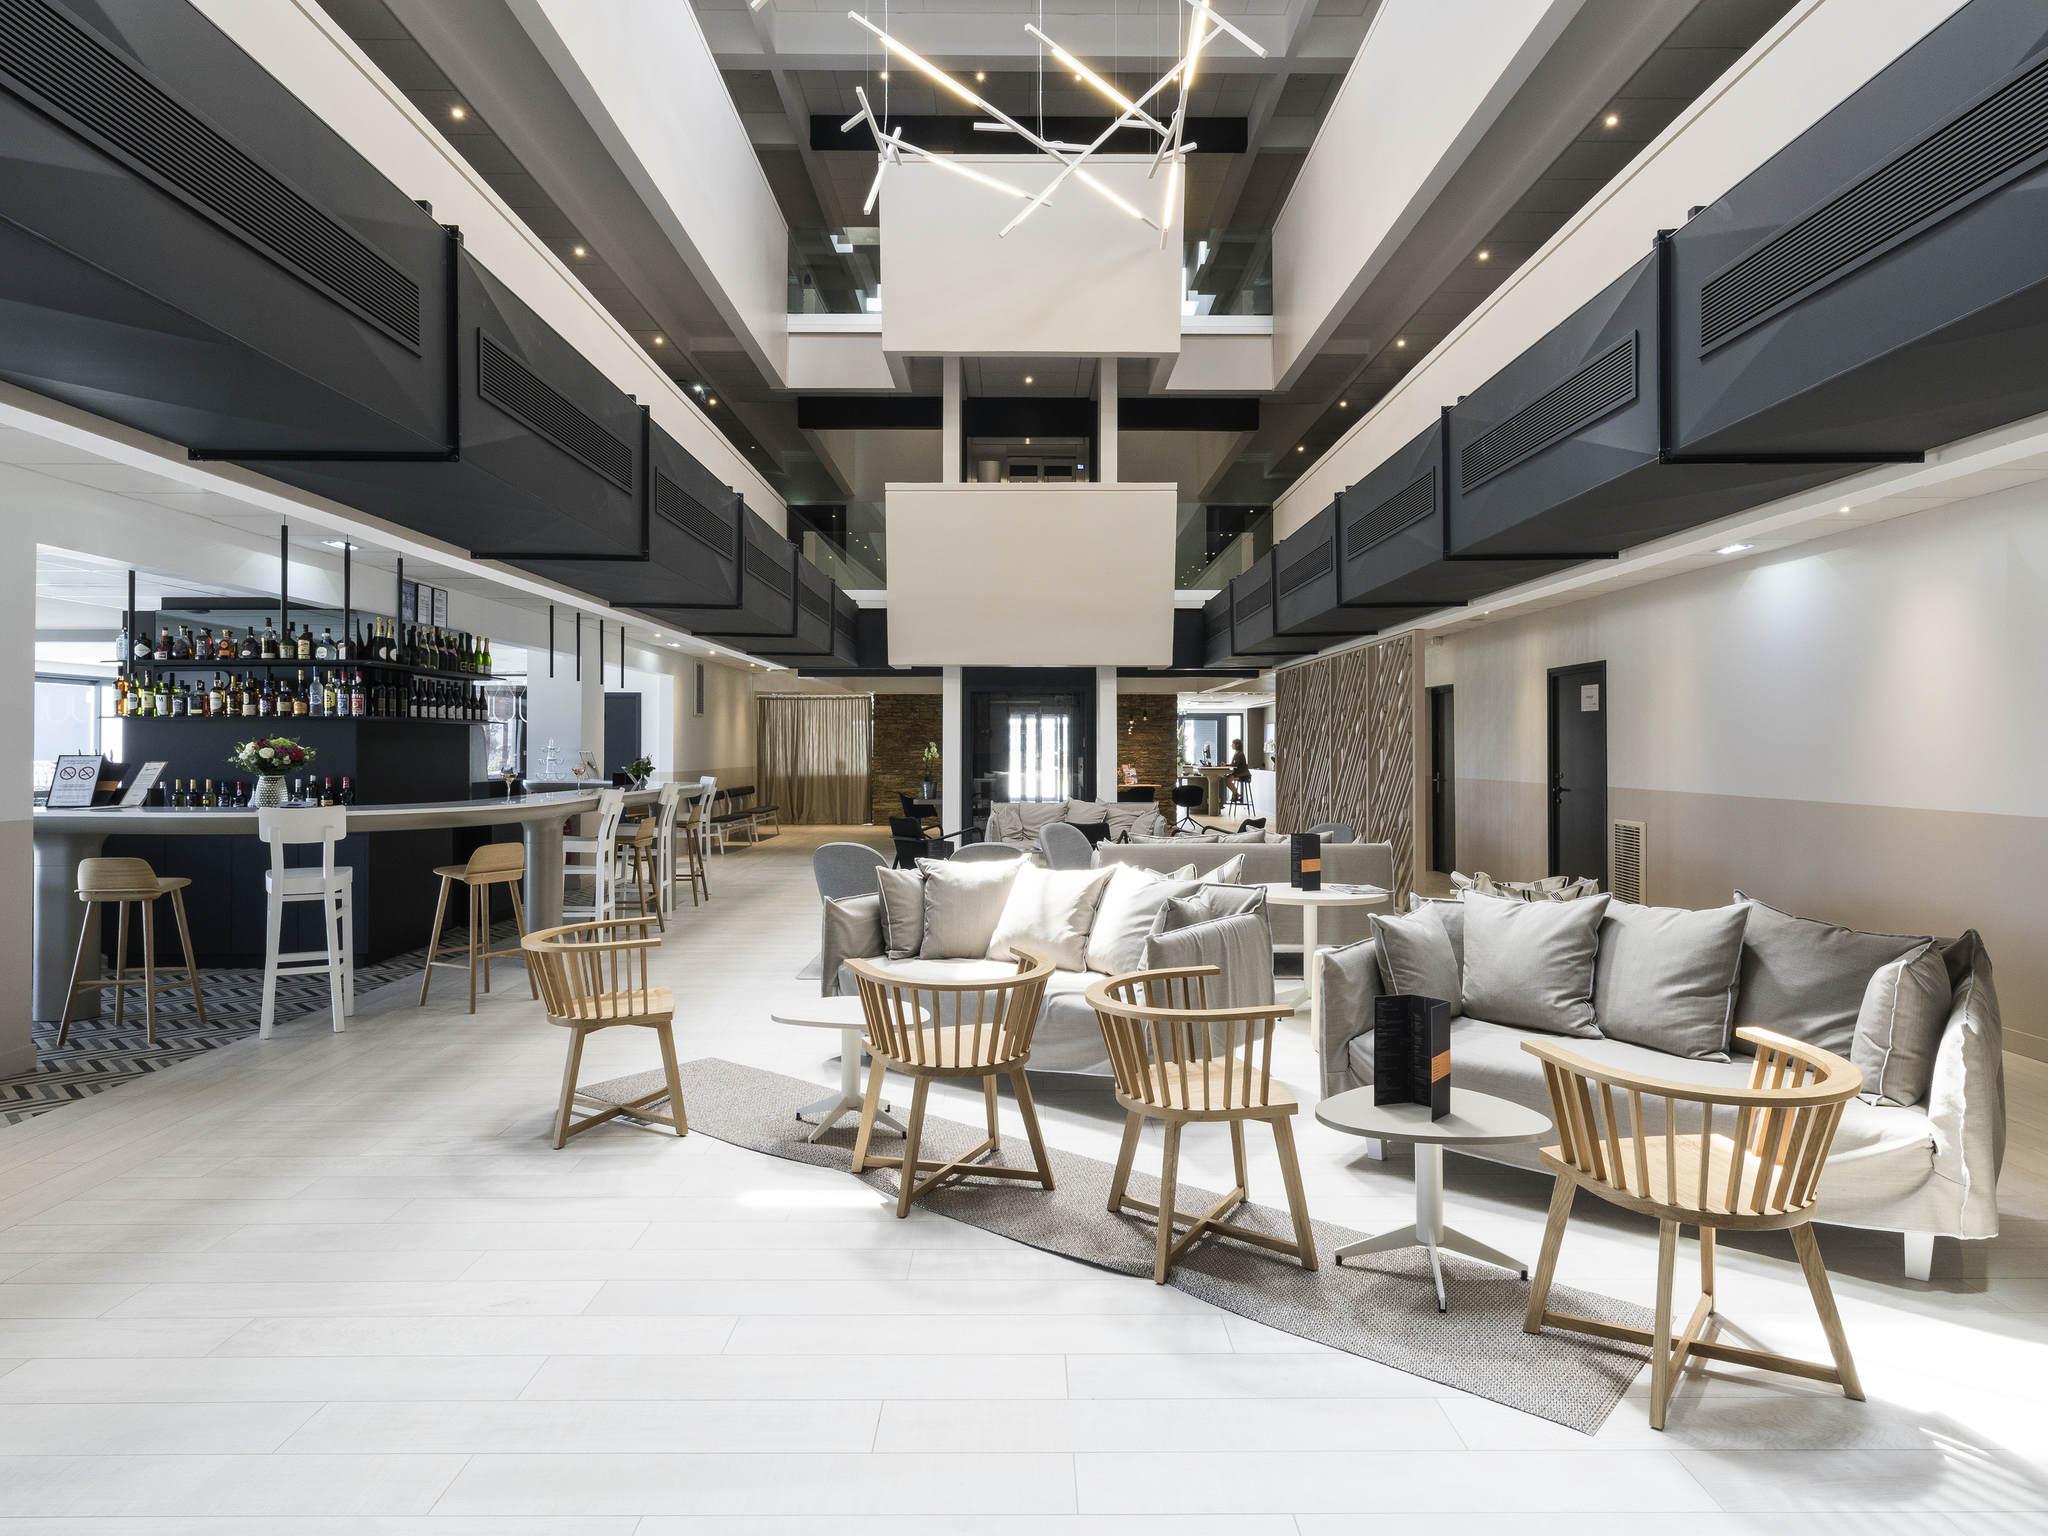 Hotel – Mercure Bastia Biguglia Hotel (abre em maio de 2018)